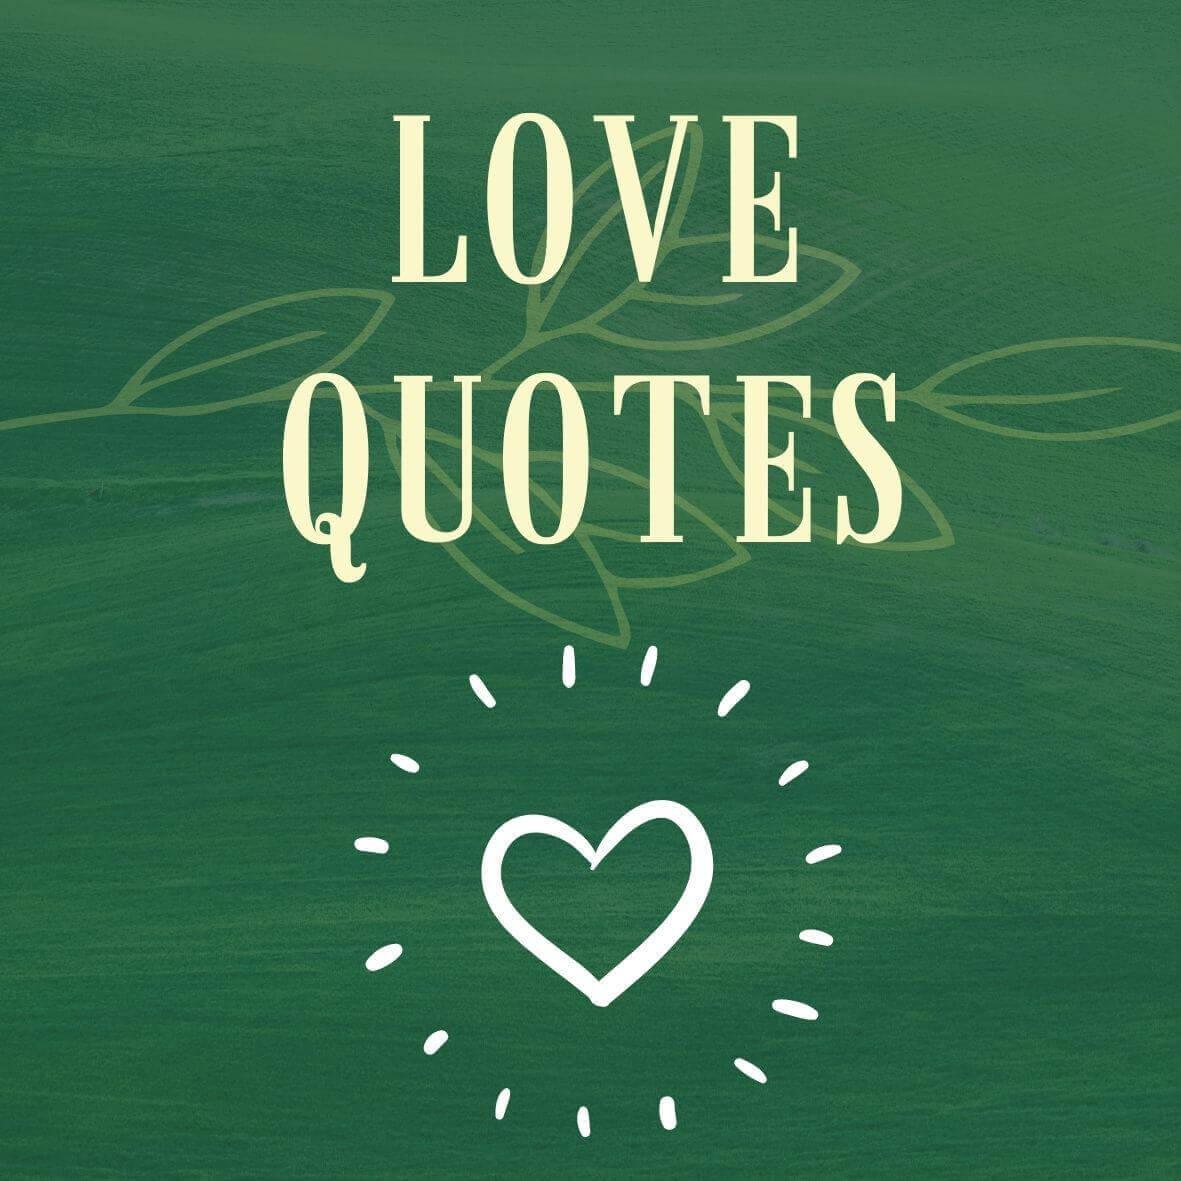 Romantic Love Quotes free image